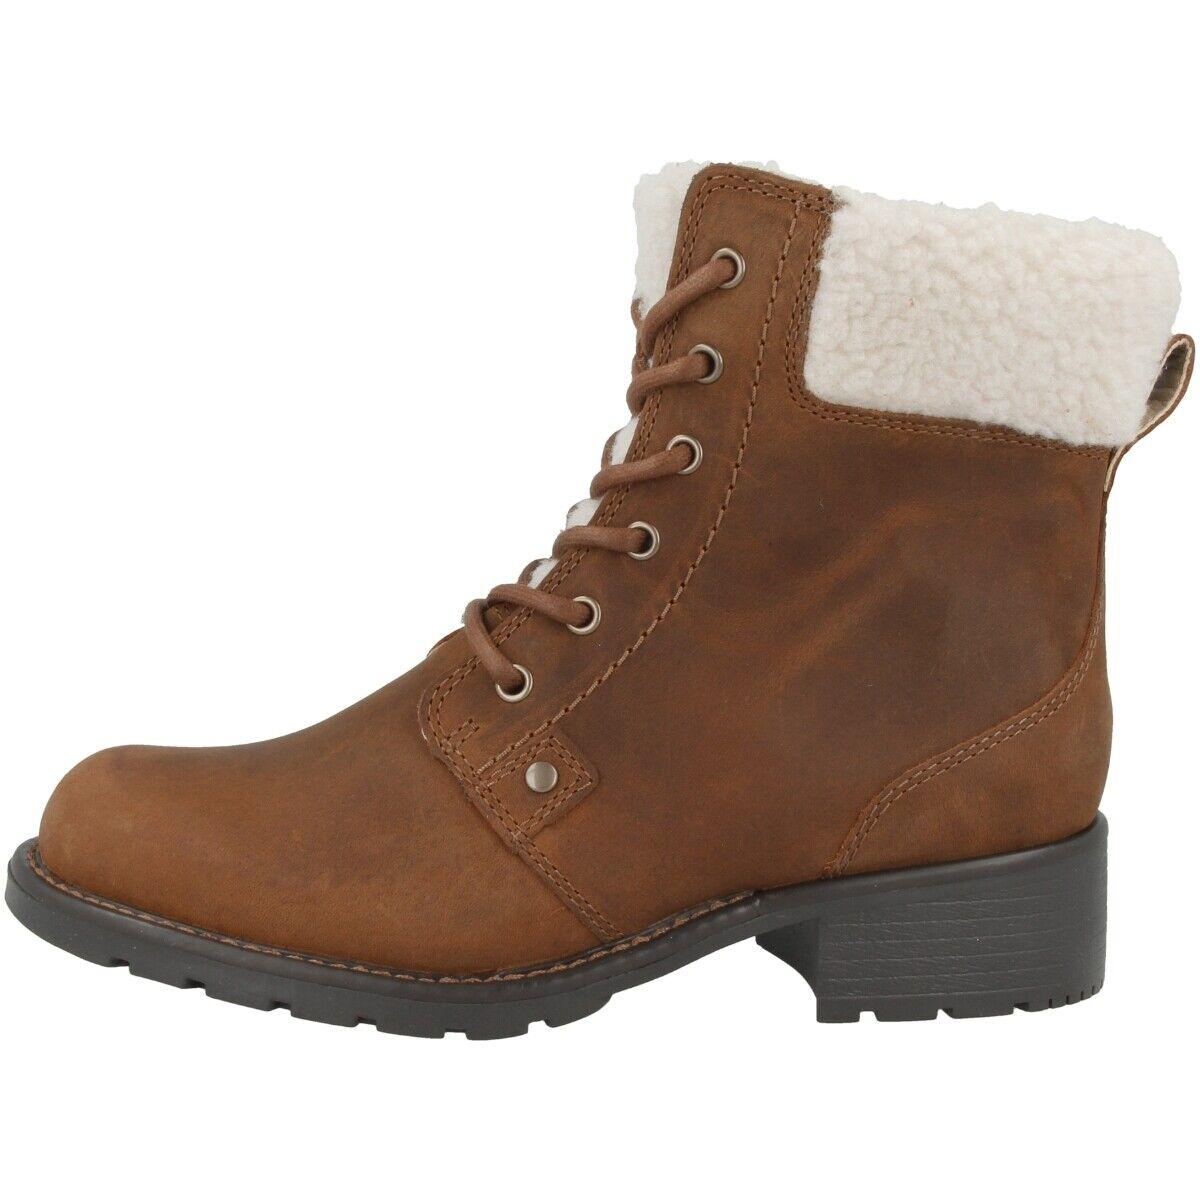 Clarks Orinoco Dusk Schuhe damen Damen Stiefel Stiefeletten gefüttert 26146419